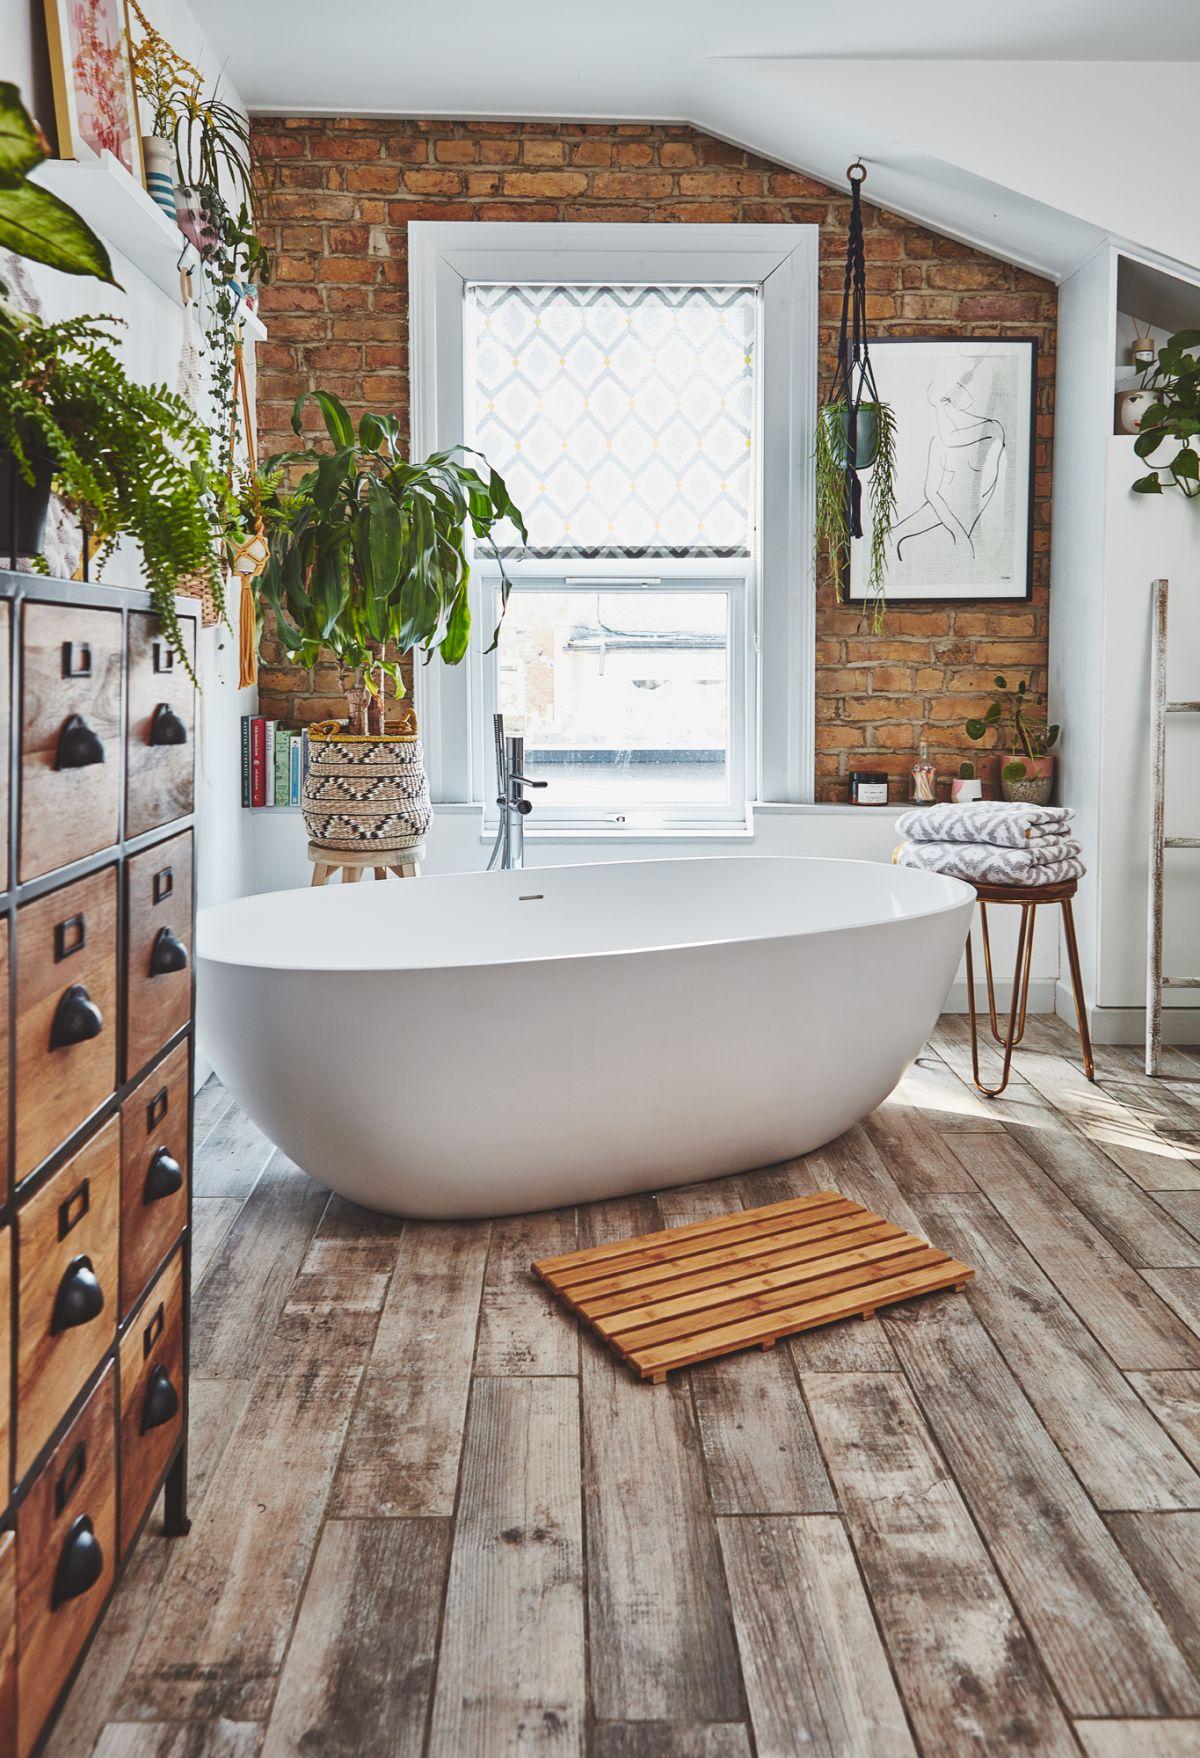 Rustic Bathroom Ideas 10 Ways To, Rustic Bathroom Wall Decor Ideas